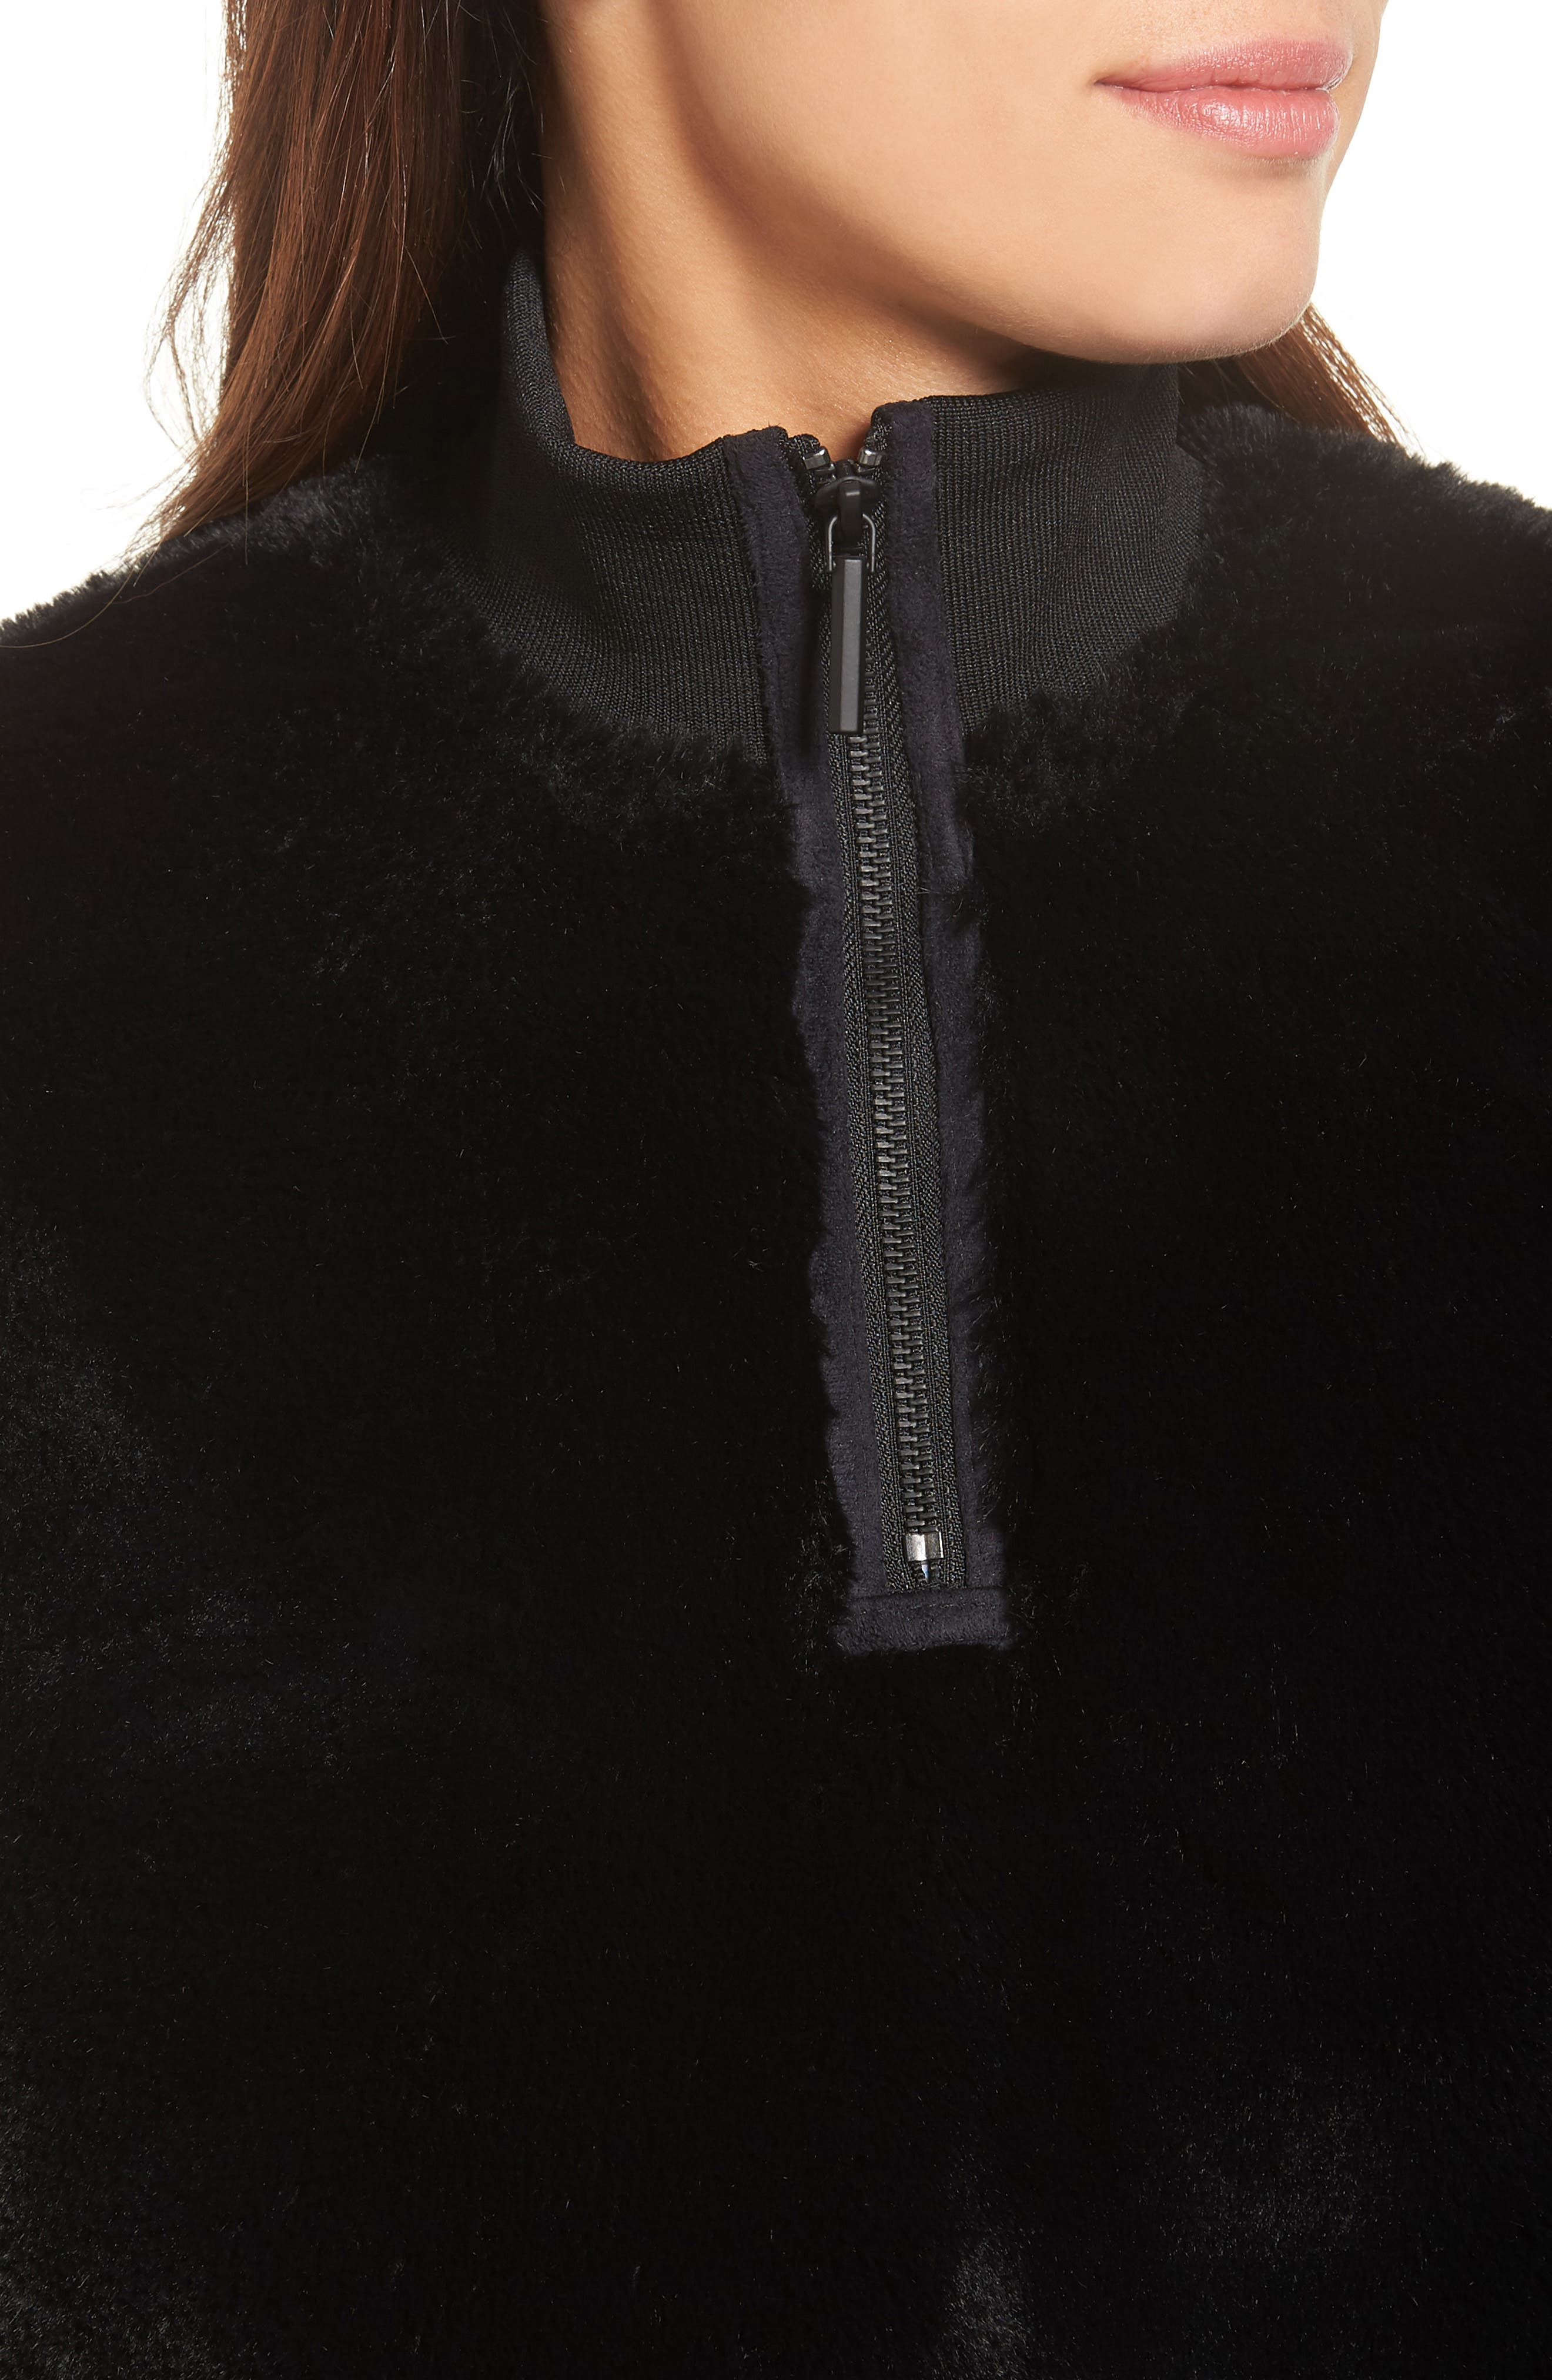 KENNETH COLE NEW YORK, Half-Zip Faux Fur Sweatshirt, Alternate thumbnail 4, color, BLACK